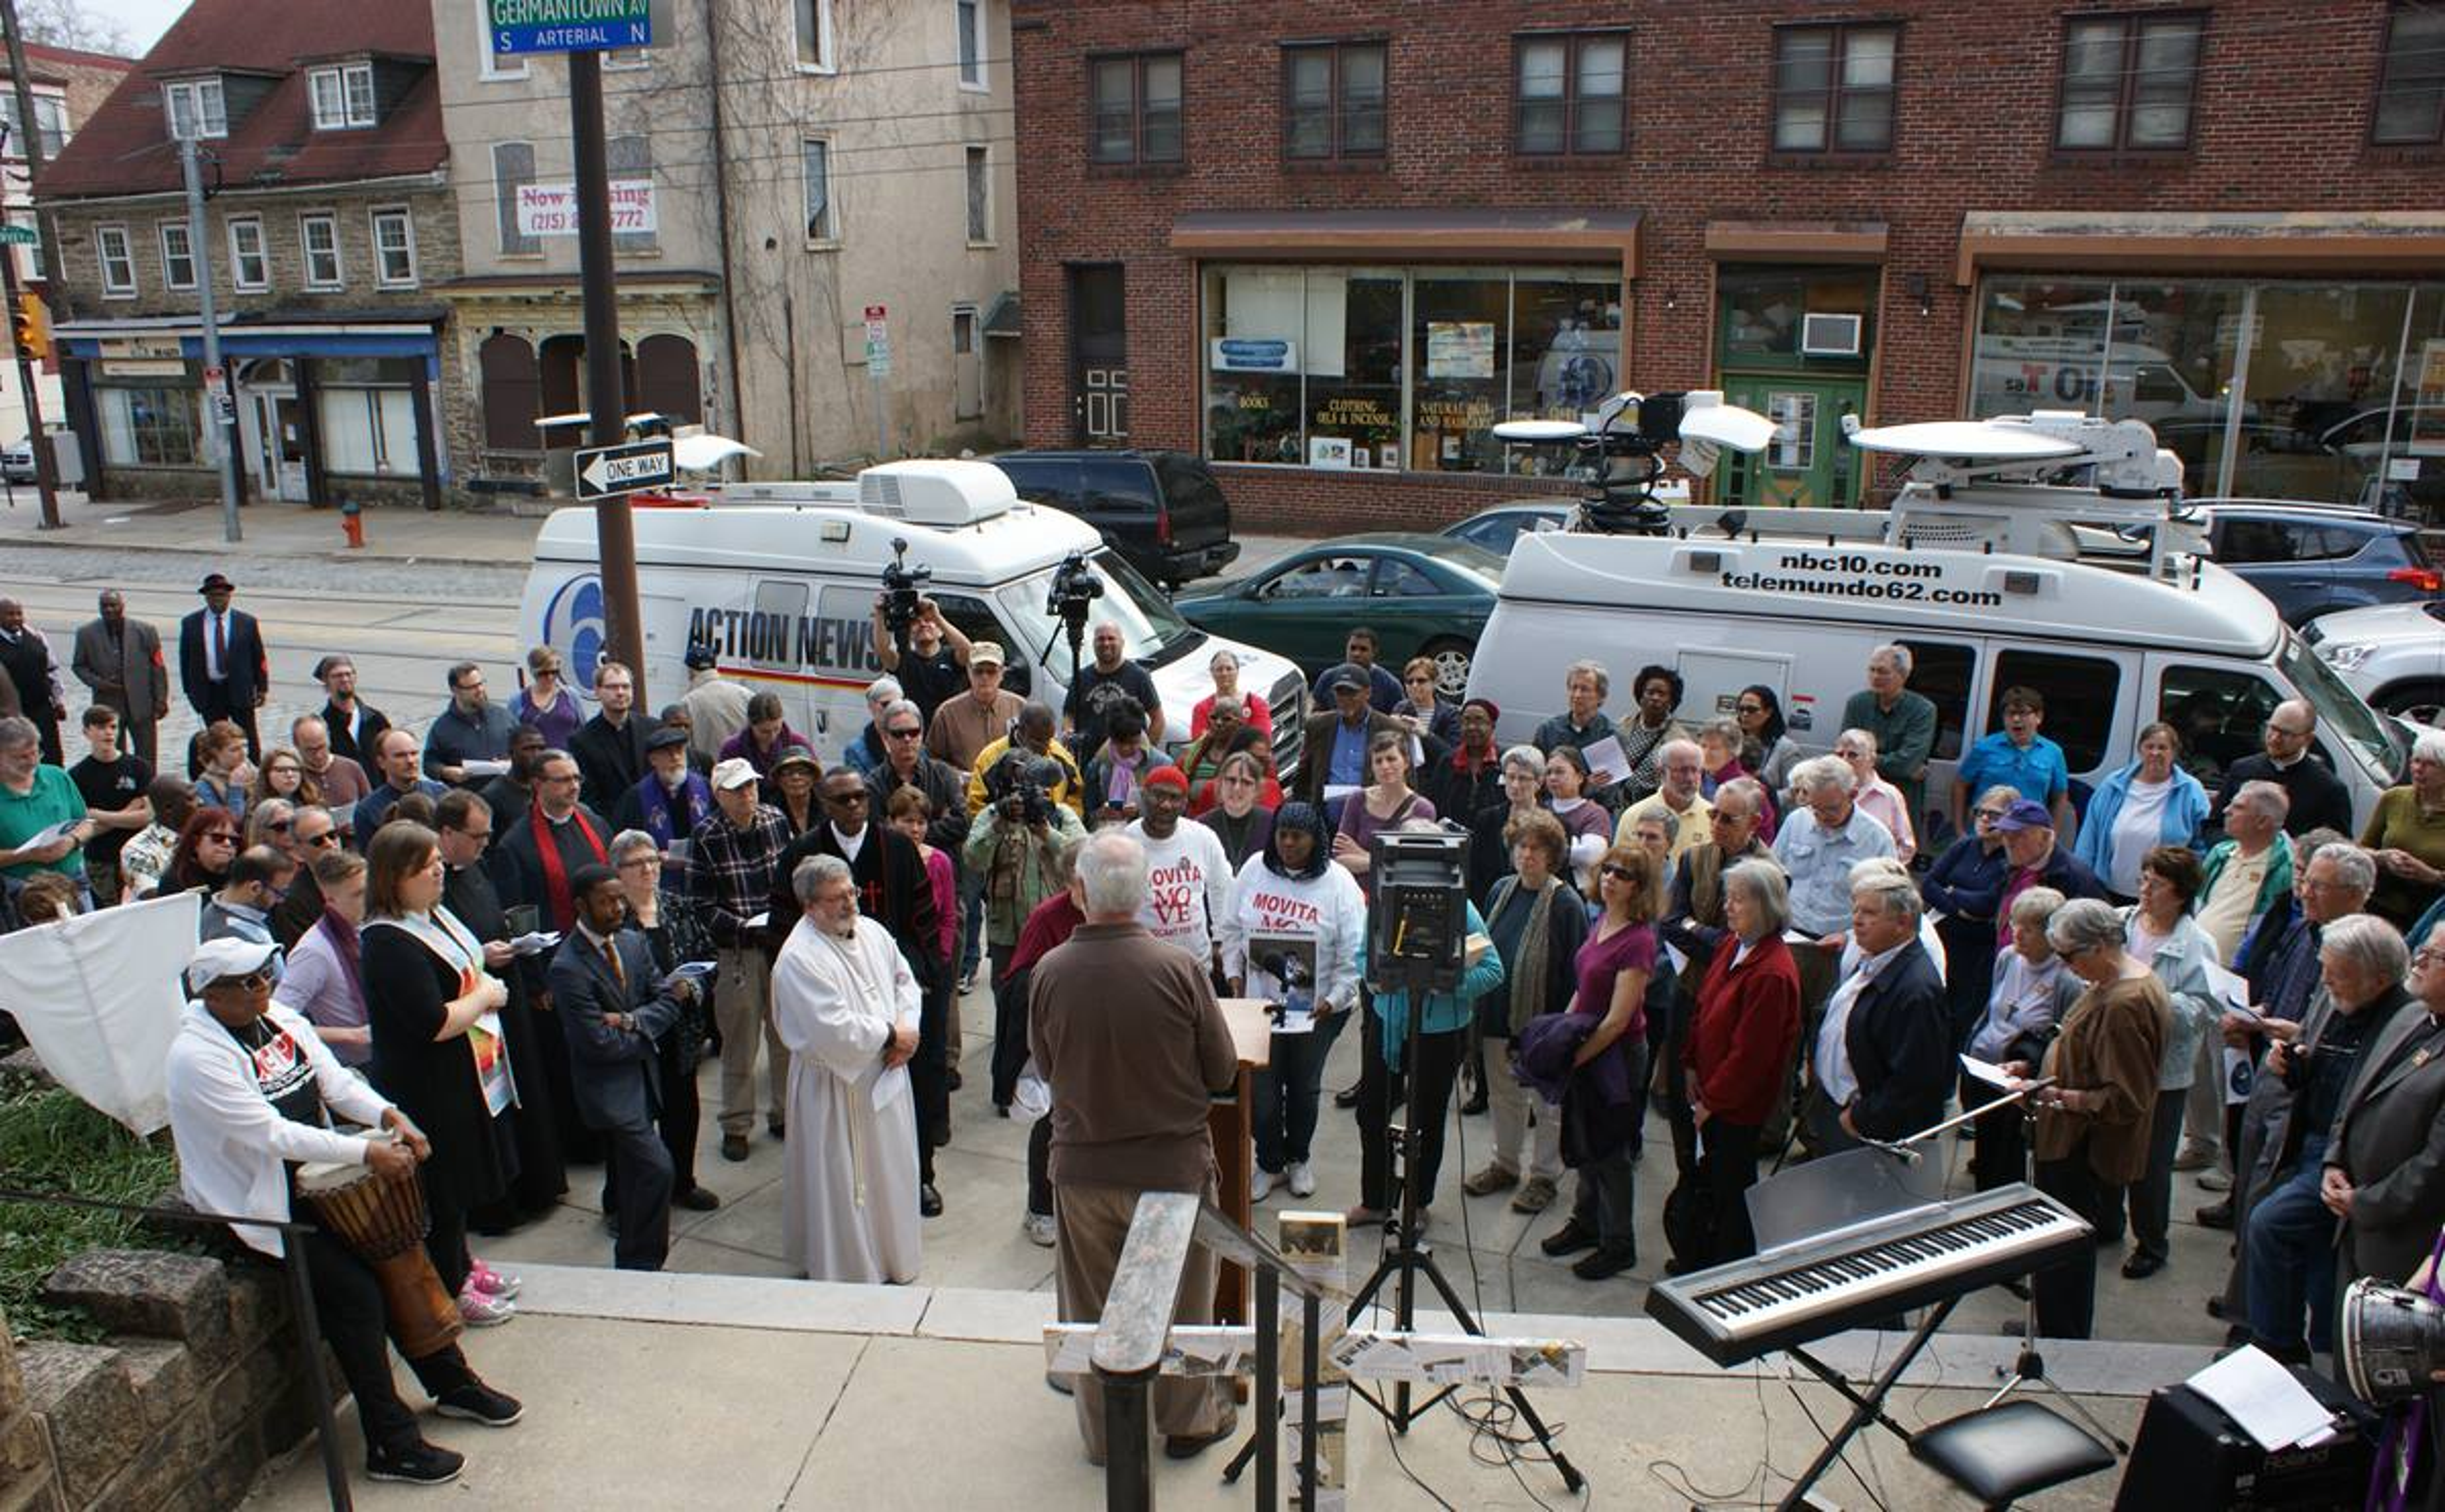 A crowd of more than 200 people of many faiths listens prior to walking through Philadelphia's gun damaged Germantown neighborhood.